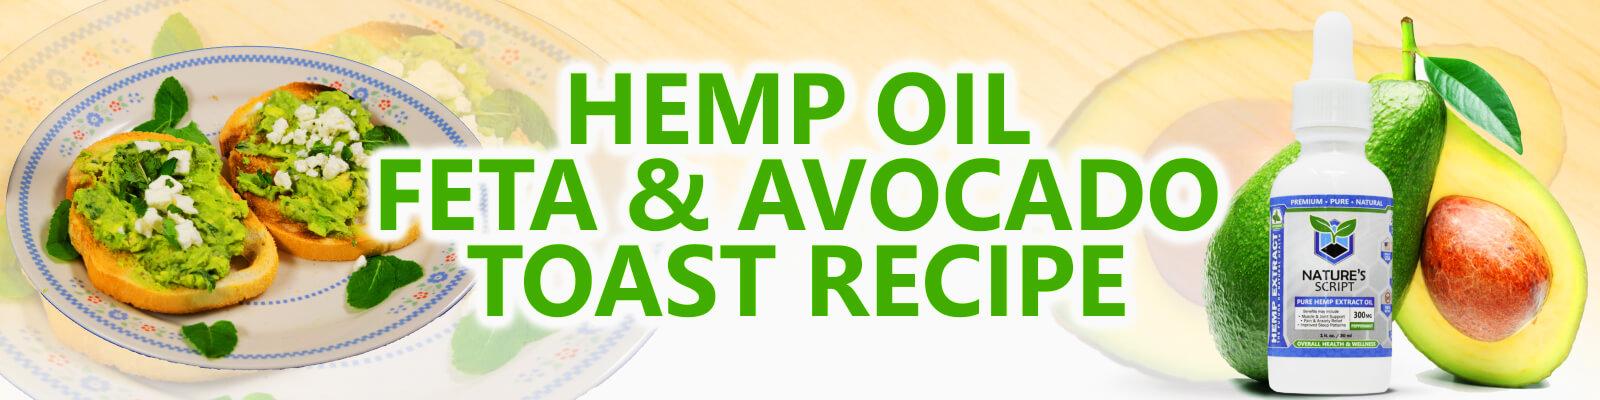 hemp oil avocado toast banner